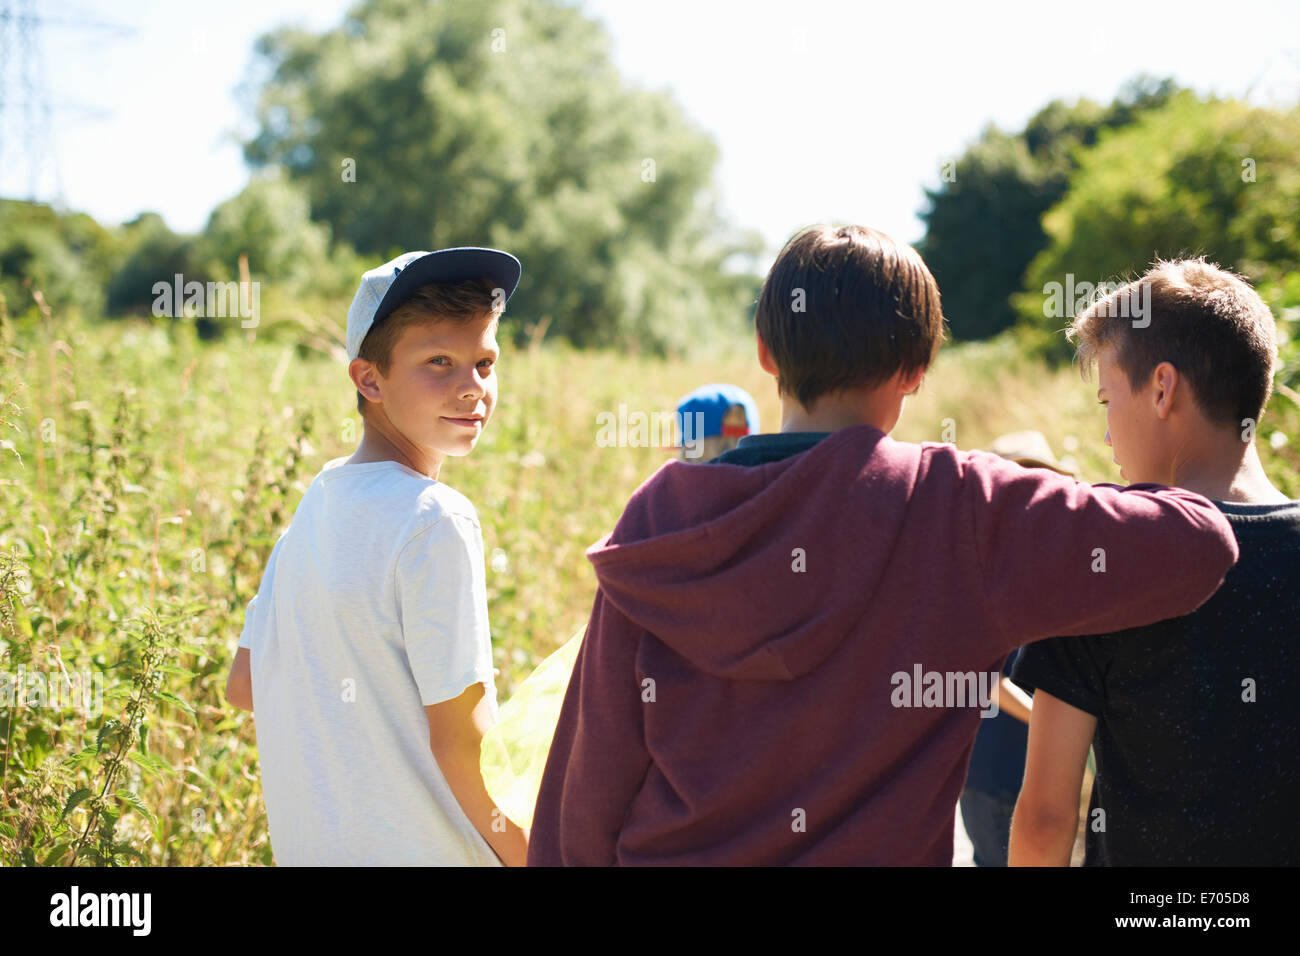 Retrato de niño con gorra con amigos Foto de stock